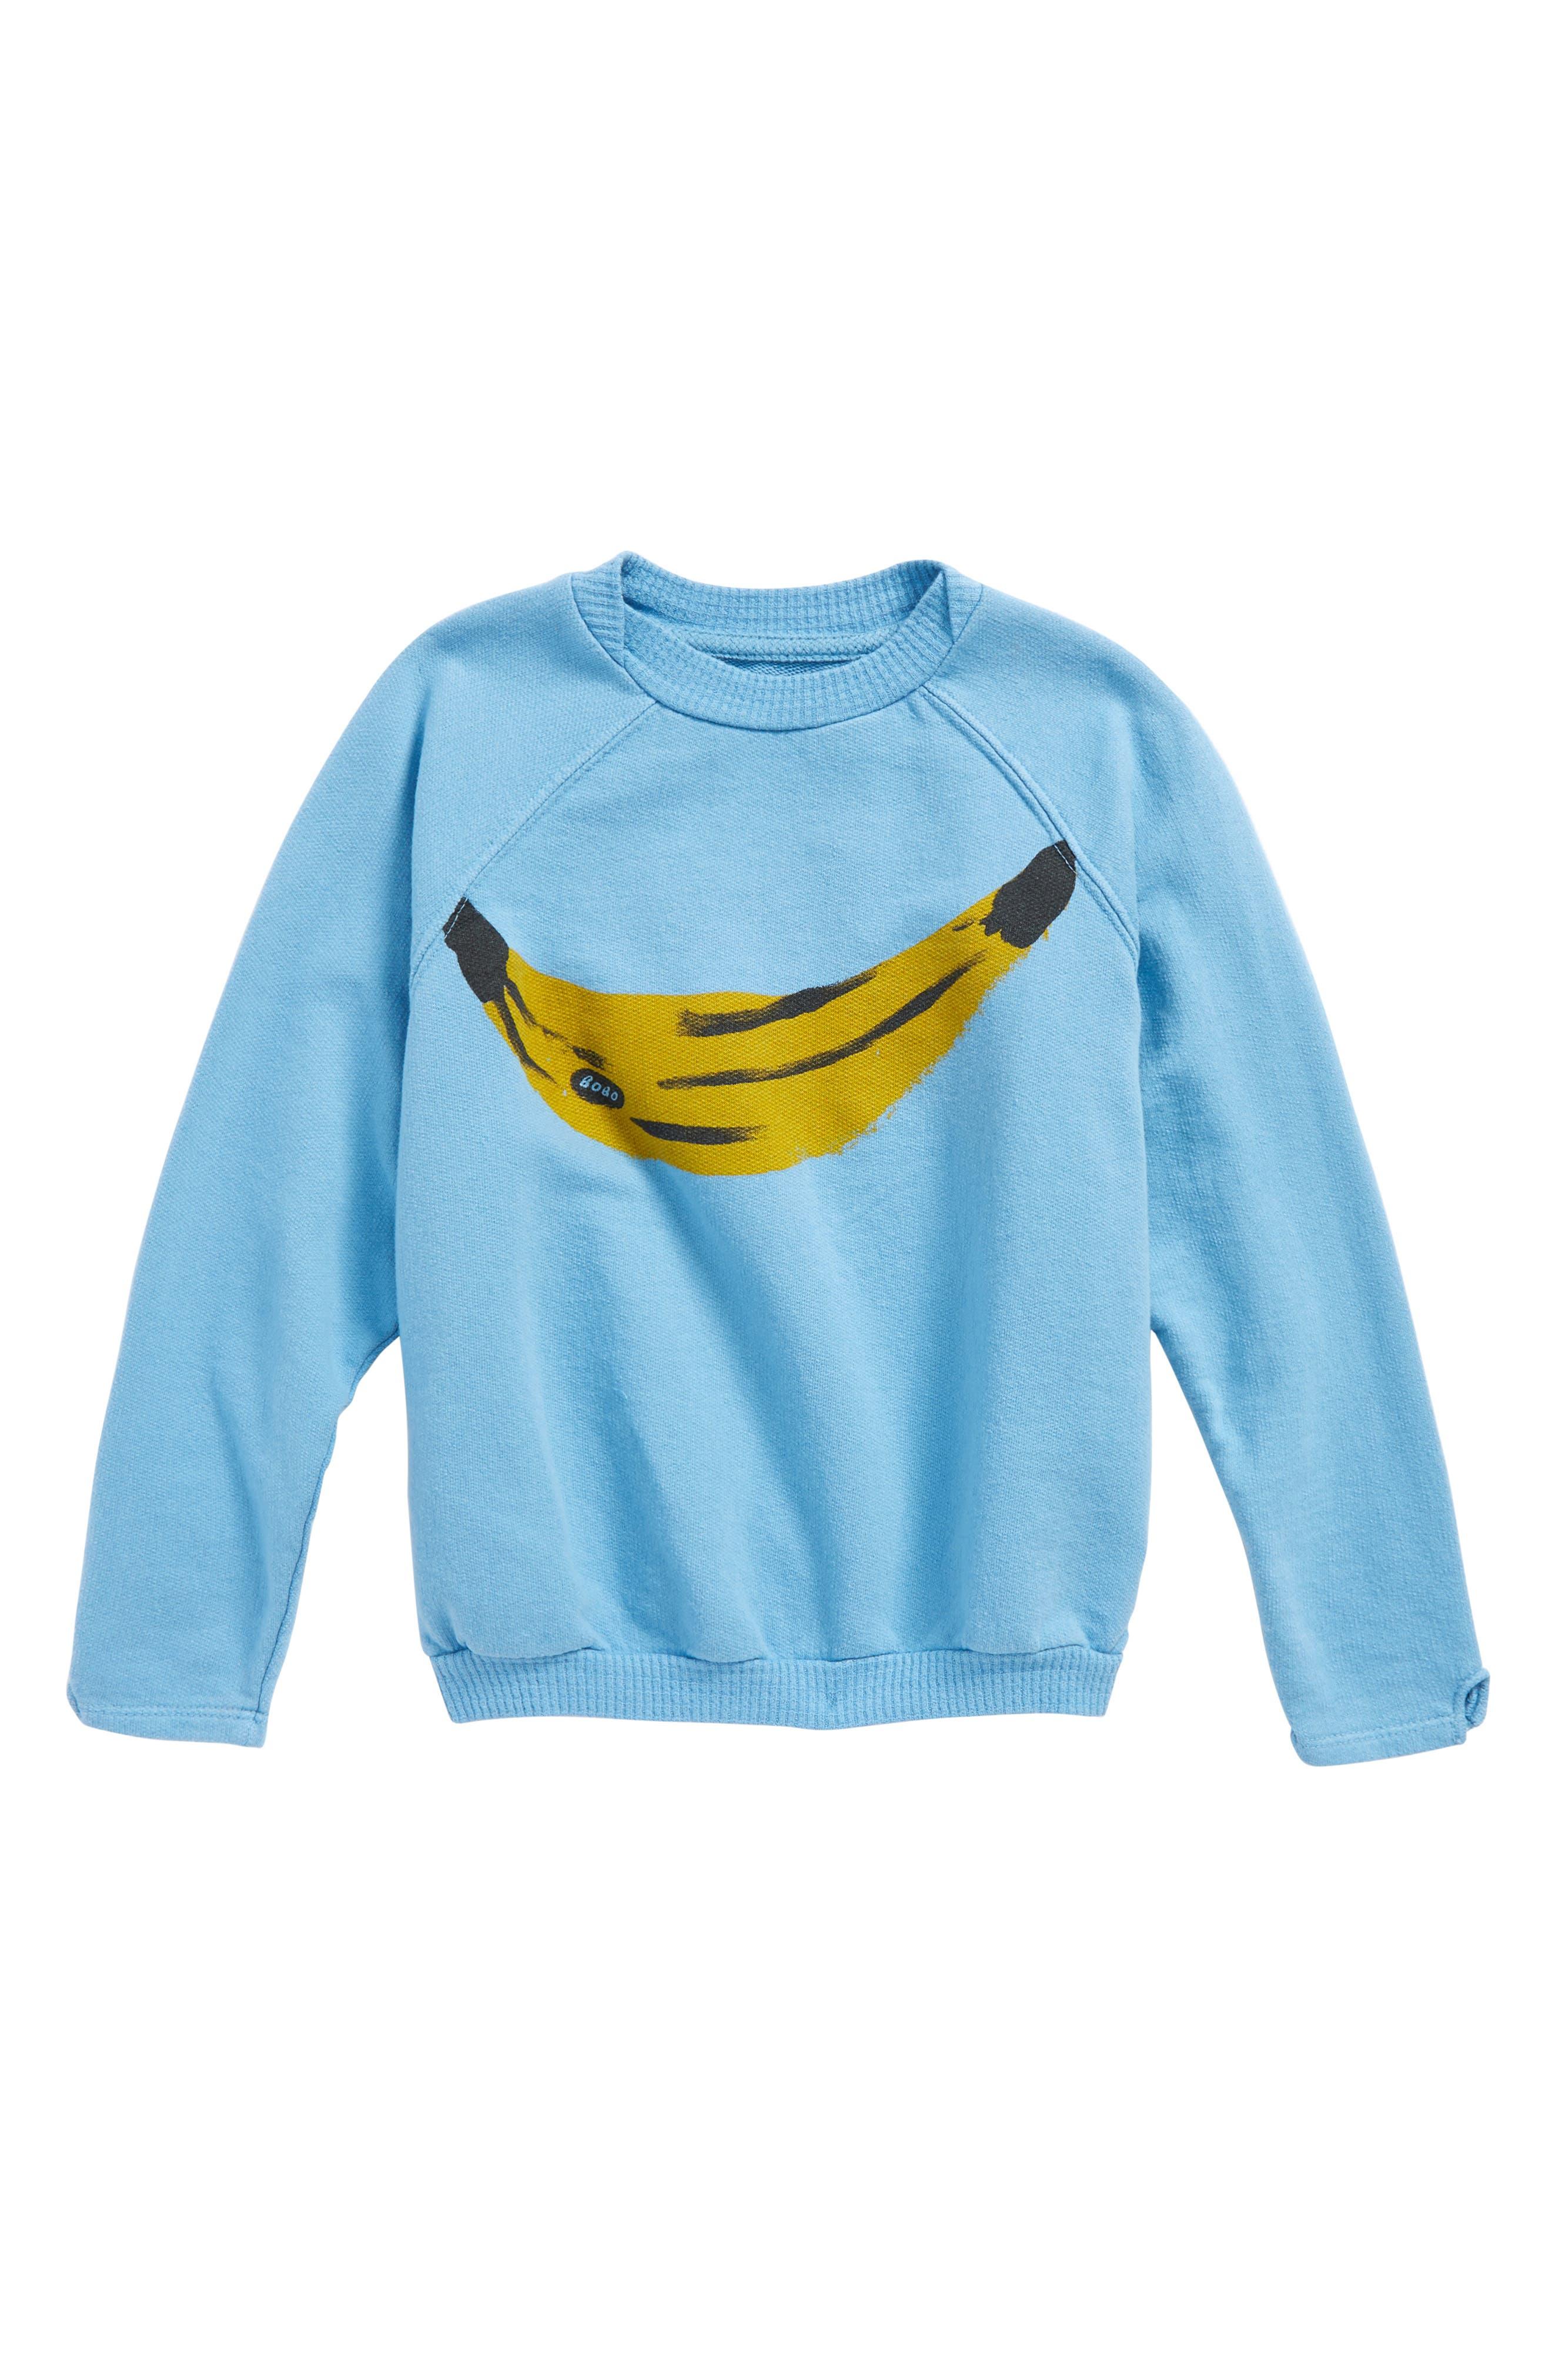 Banana Organic Cotton Sweatshirt,                         Main,                         color, Heritage Blue